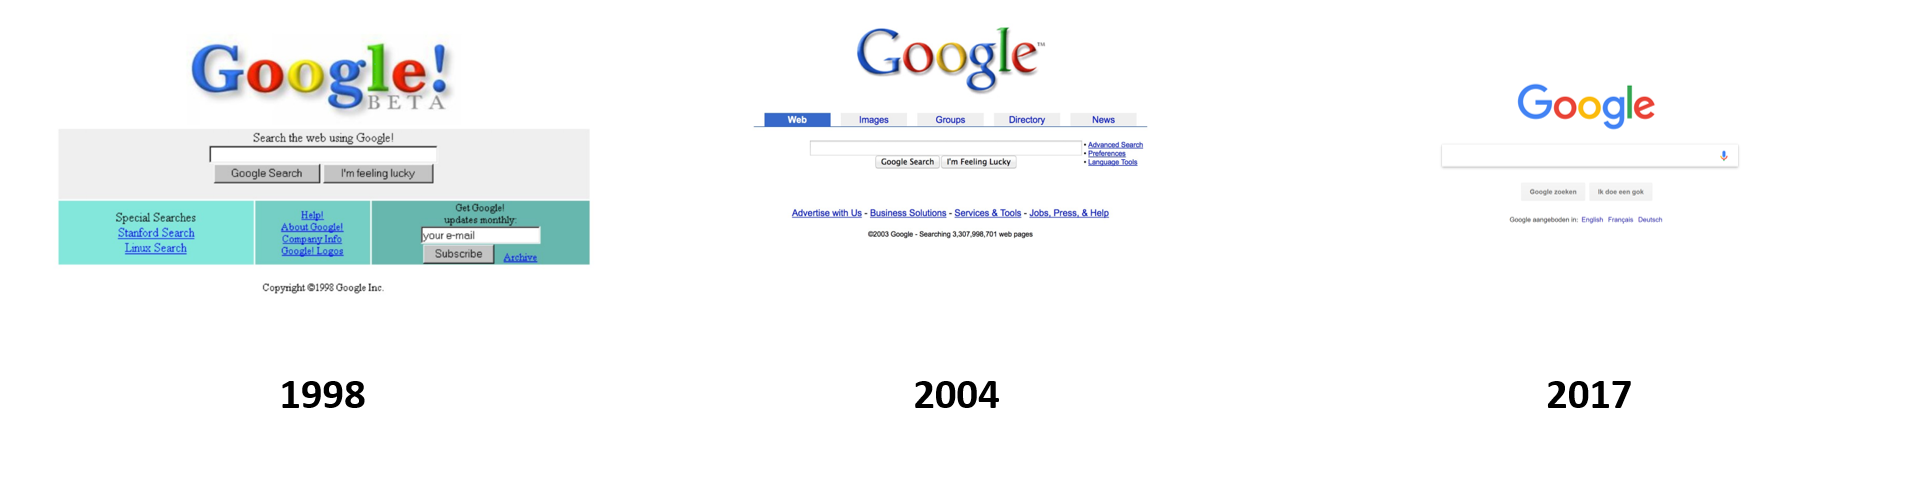 Evolution of google interface.png